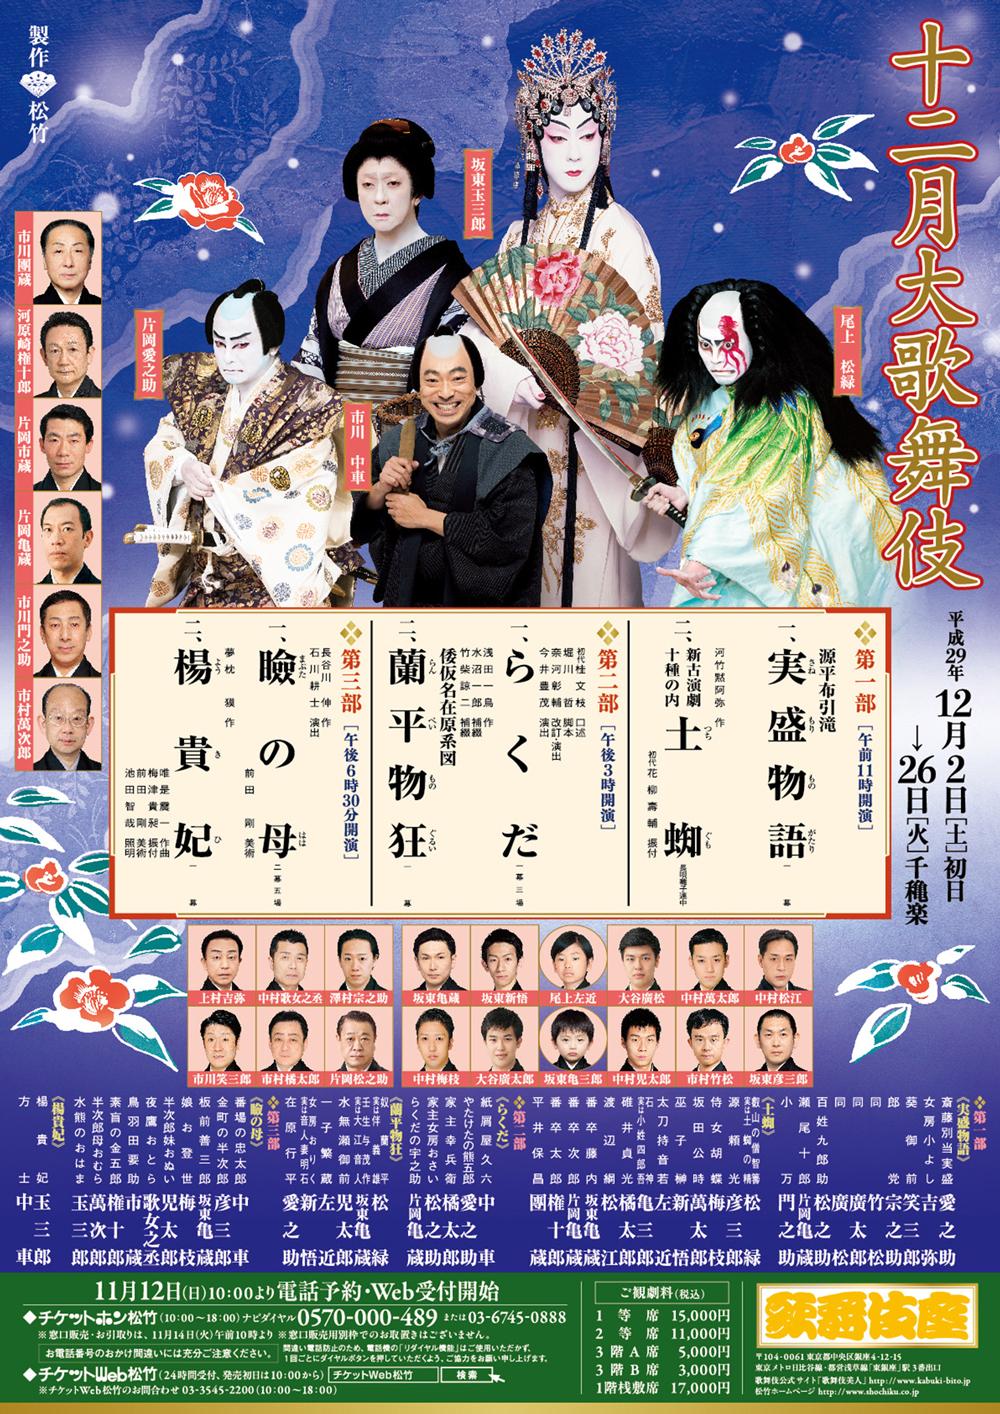 http://www.kabuki-bito.jp/uploads/images/kouen/548/kabukiza_201712fffl_0382af5e8a5e7da95c986222f866755c.jpg